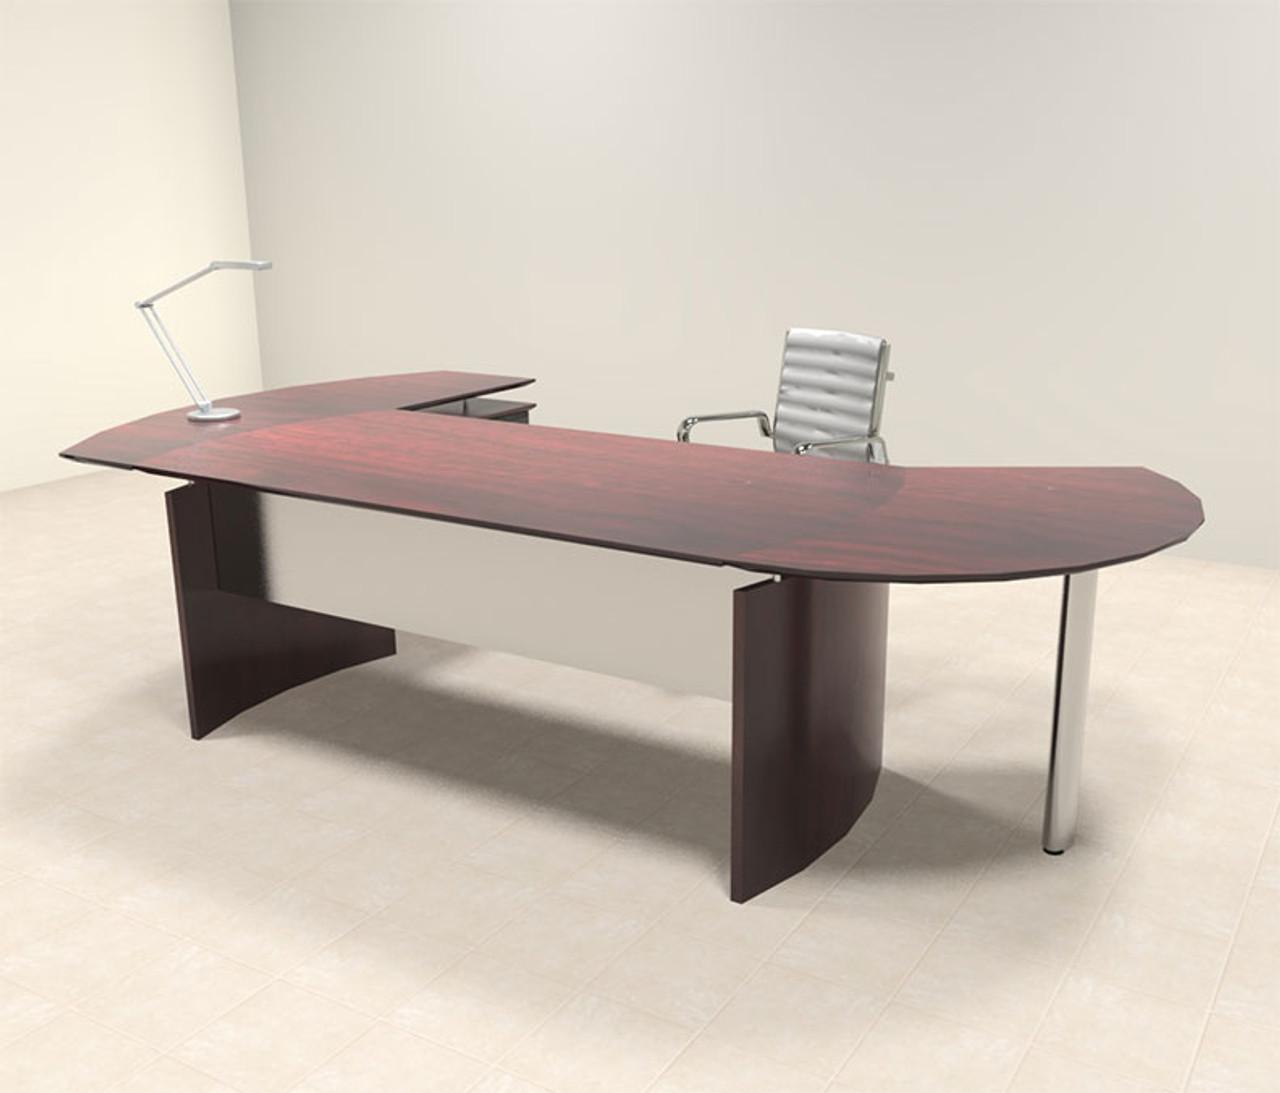 3pc Modern Contemporary Oval Executive Office Desk Set, #MT-MED-O2